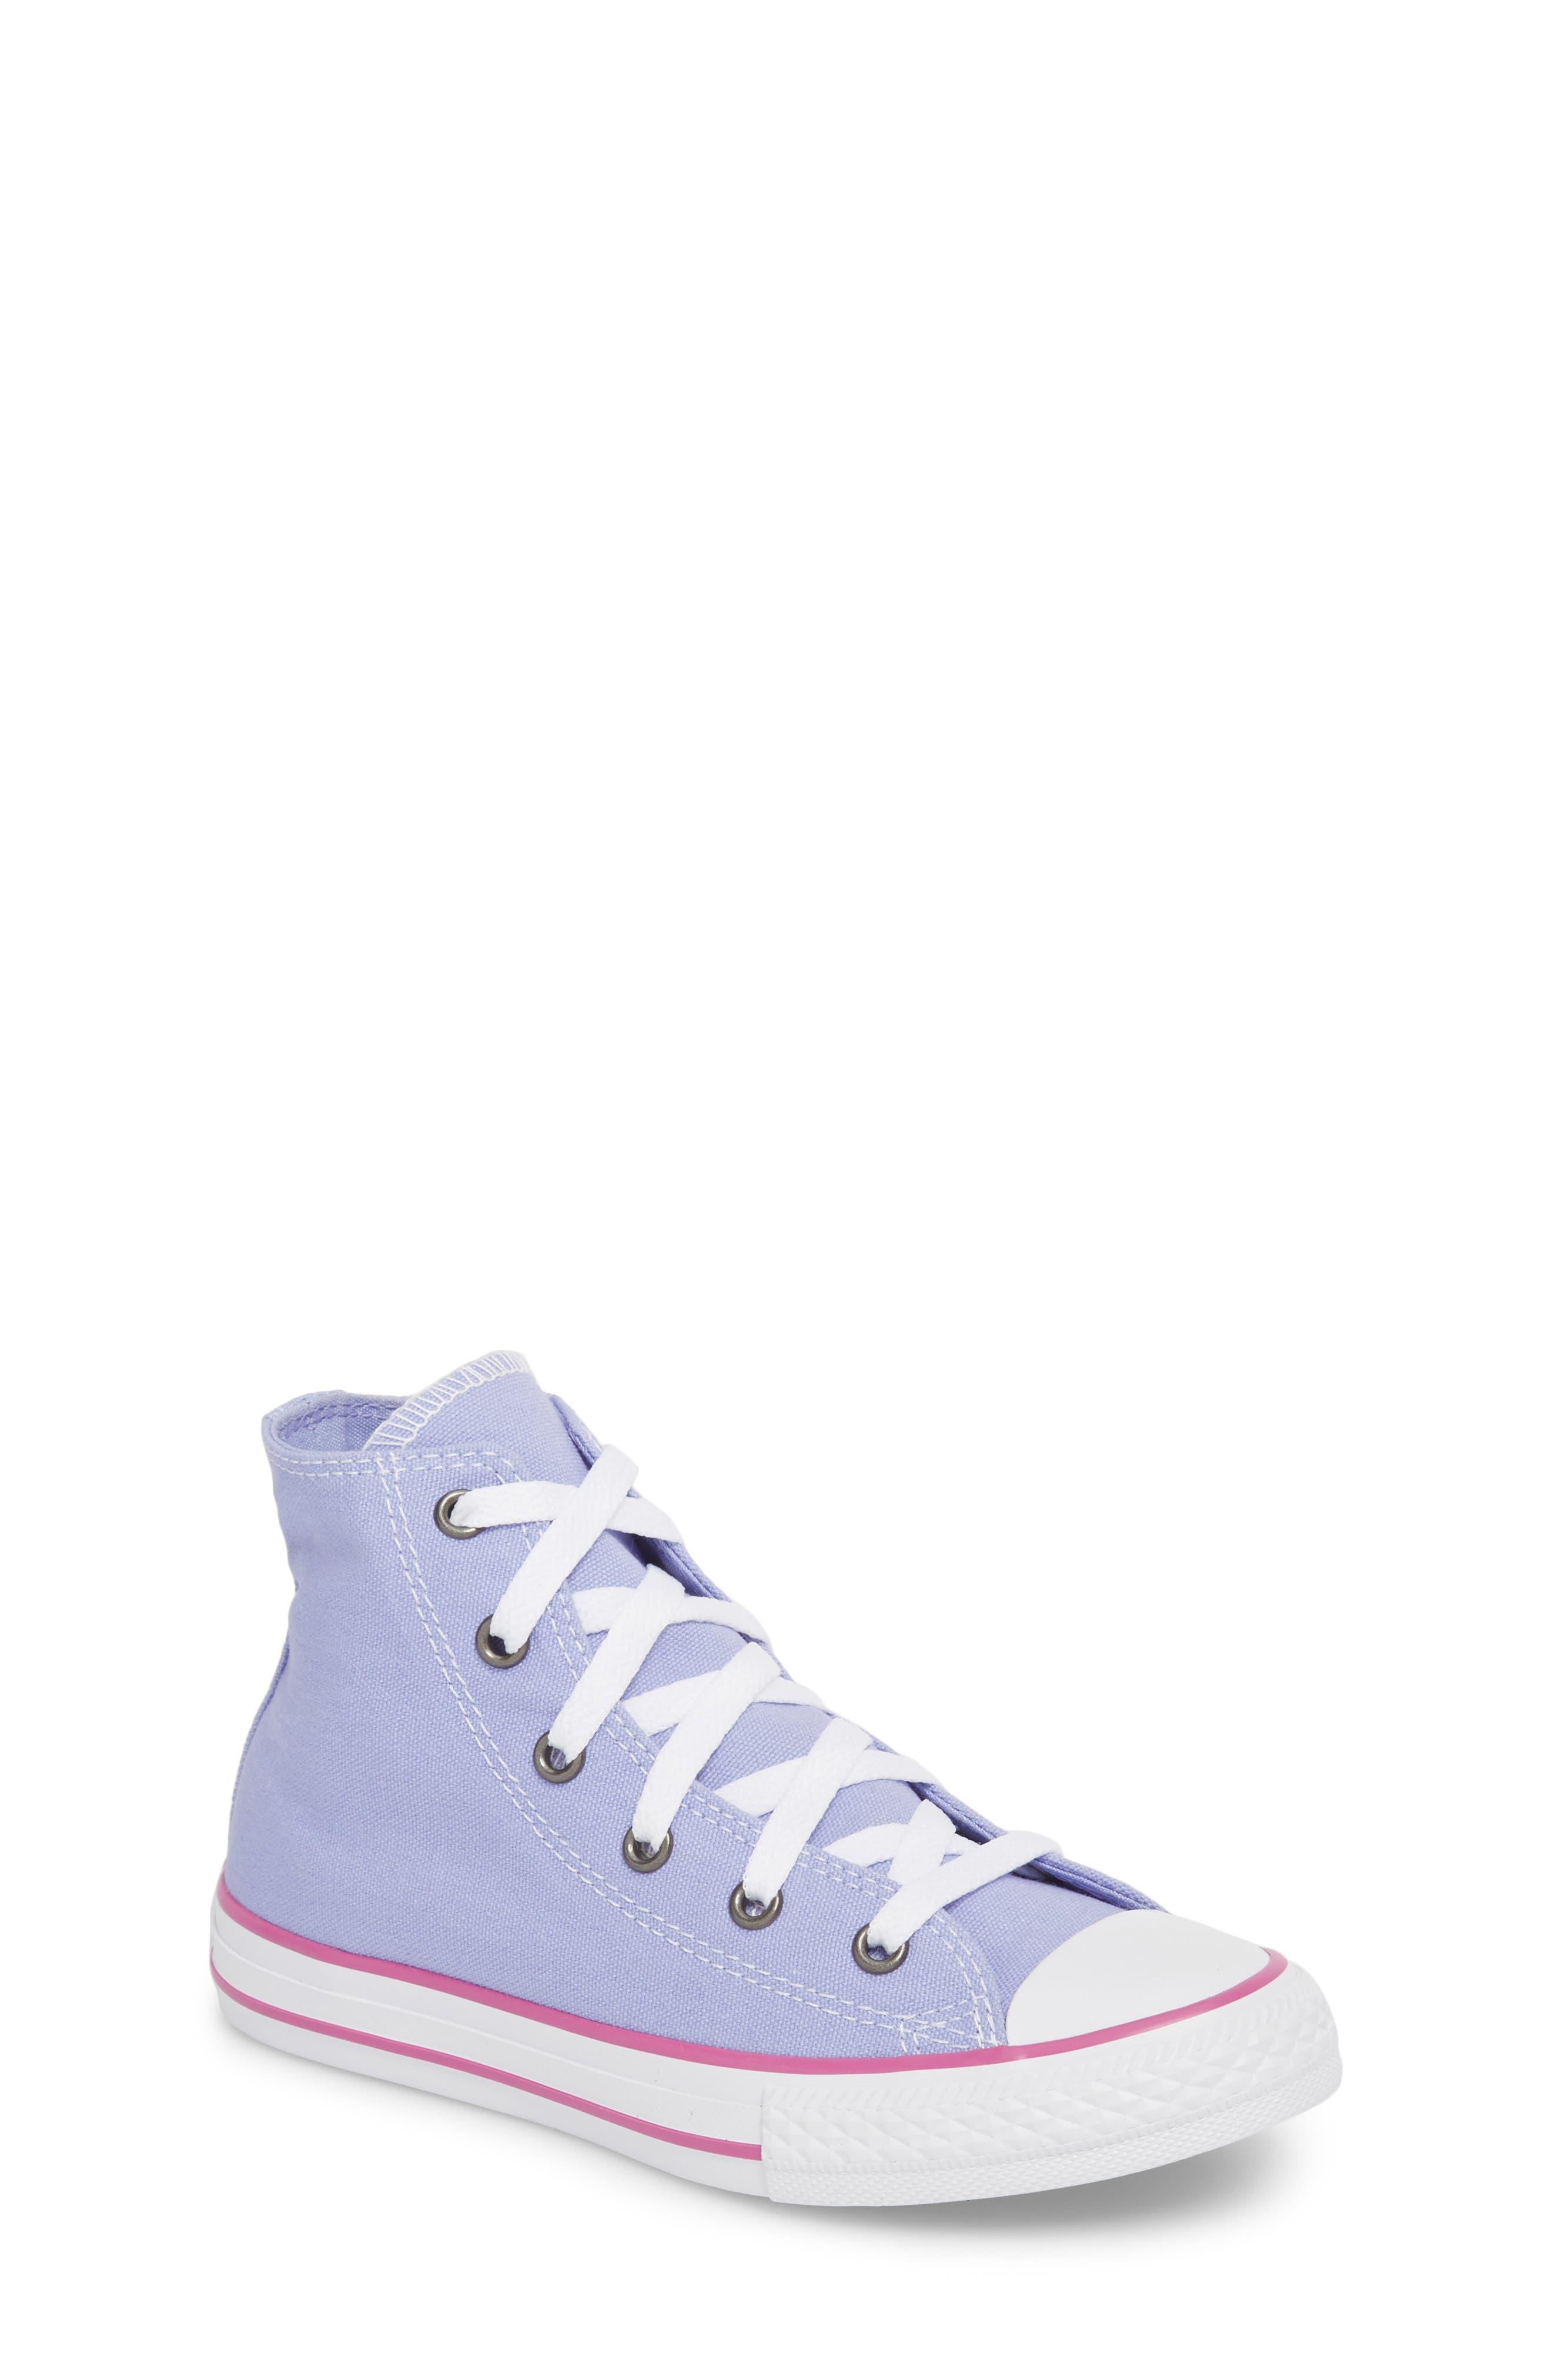 Chuck Taylor<sup>®</sup> All Star<sup>®</sup> High Top Sneaker,                             Main thumbnail 2, color,